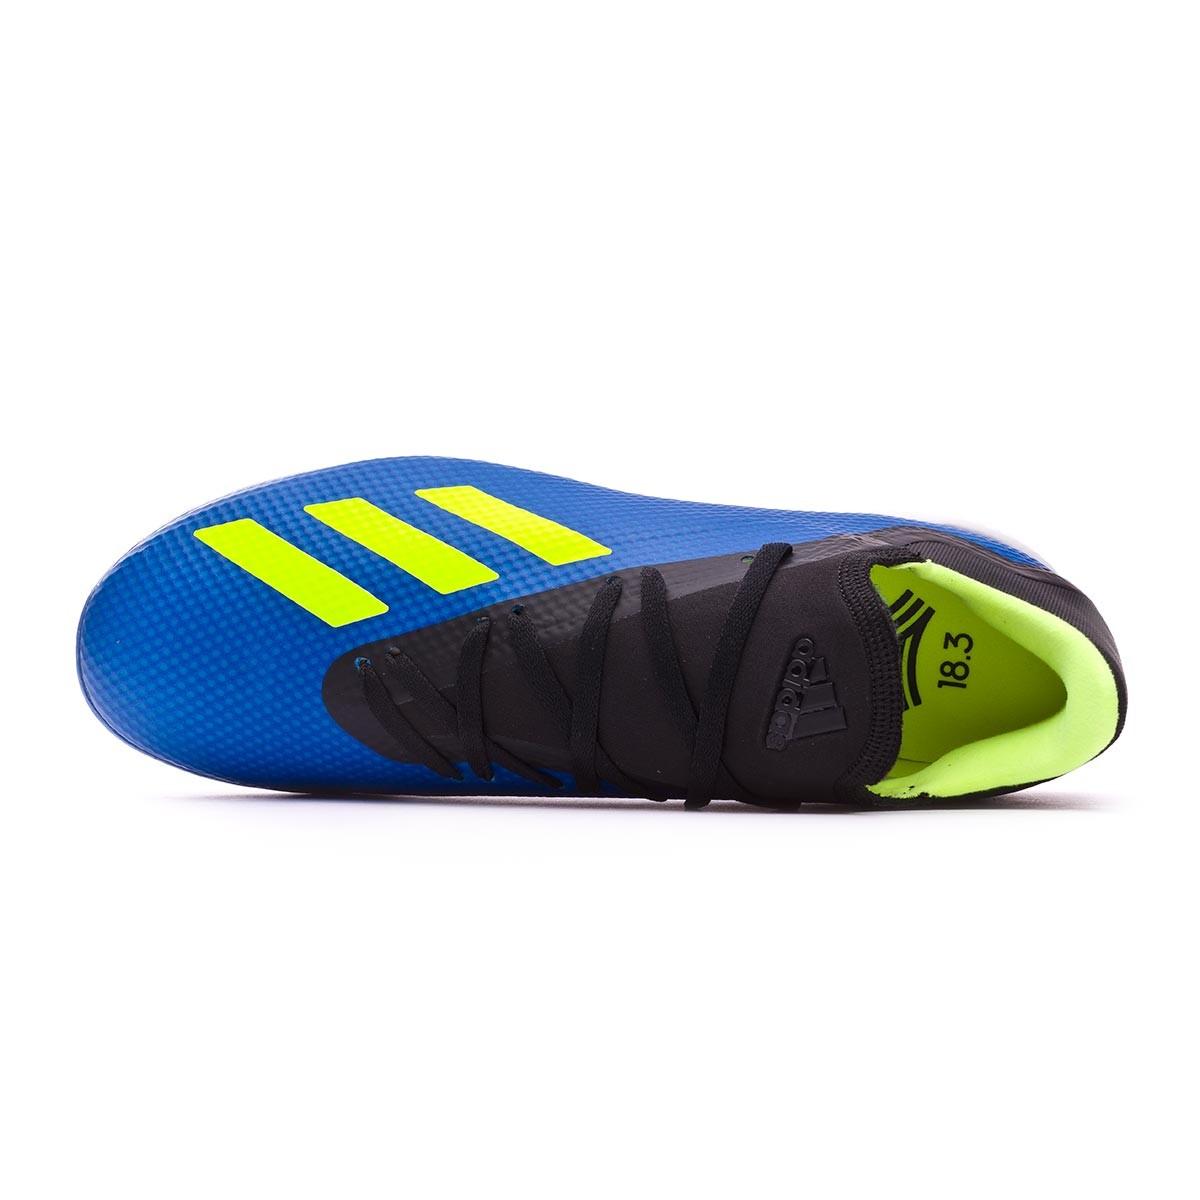 quality design d12e4 5a76e Football Boot adidas X Tango 18.3 Turf Foot blue-Solar yellow-Black -  Tienda de fútbol Fútbol Emotion